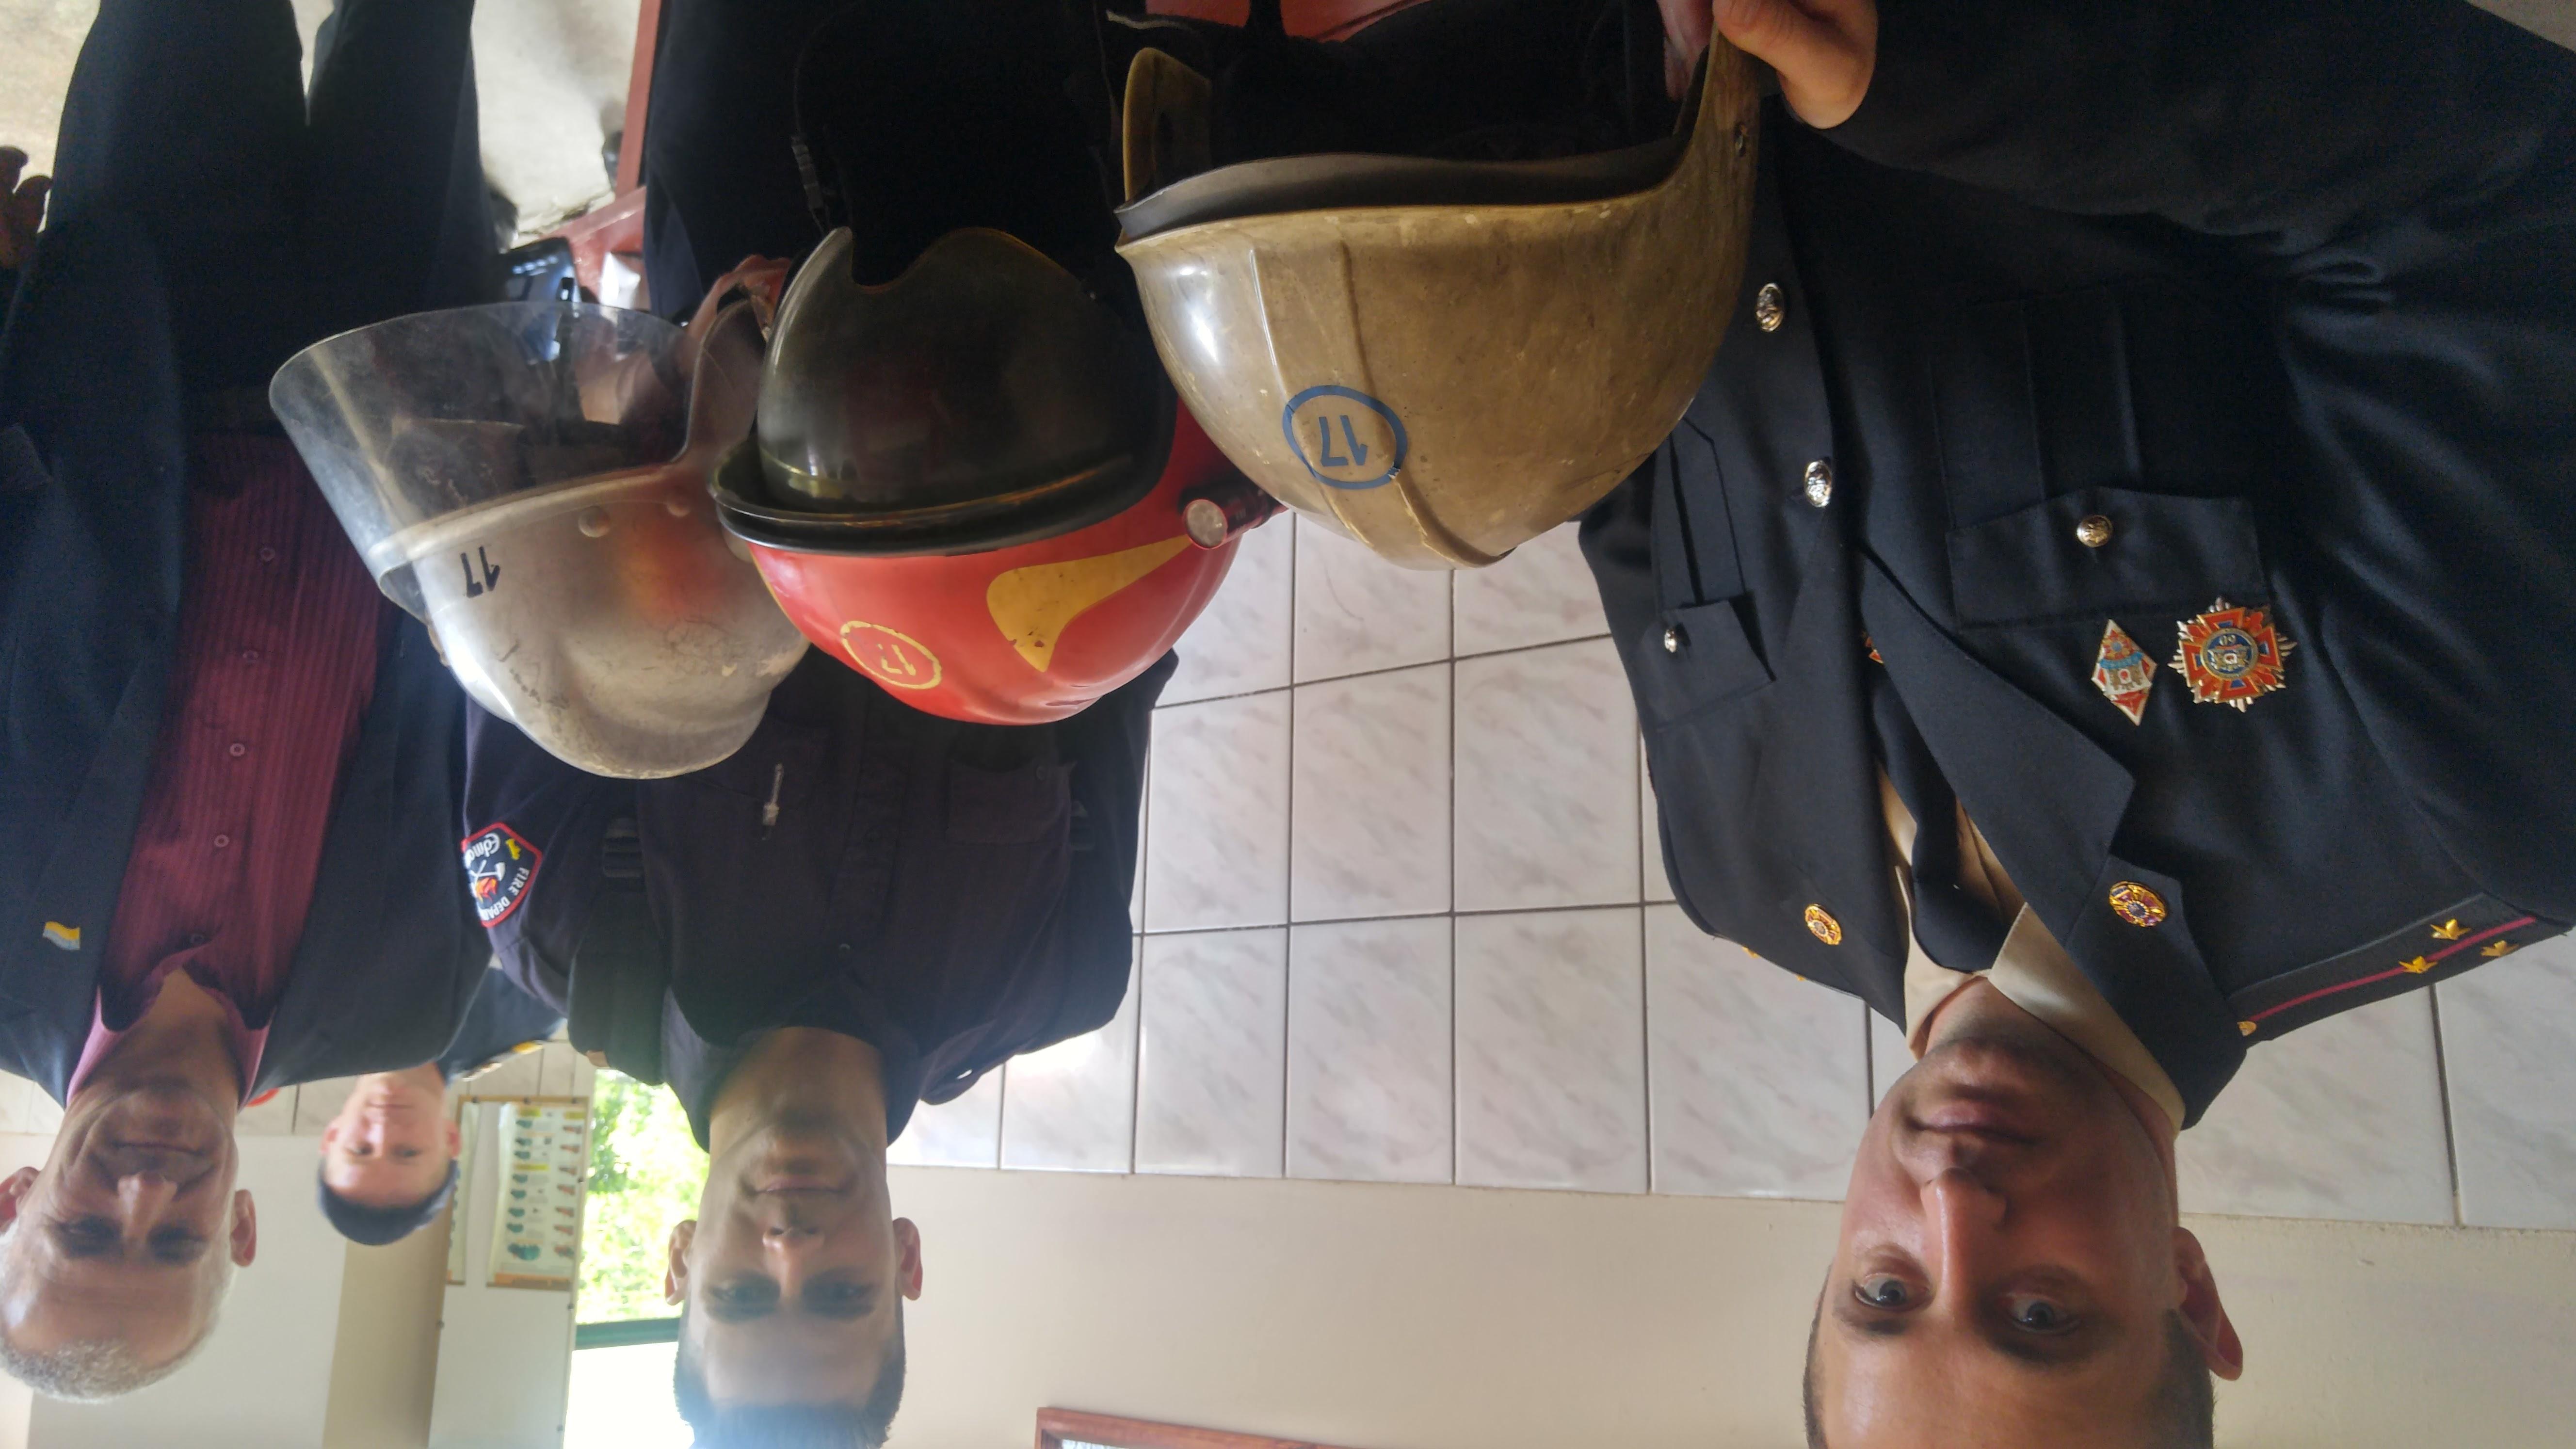 inspecting helmets